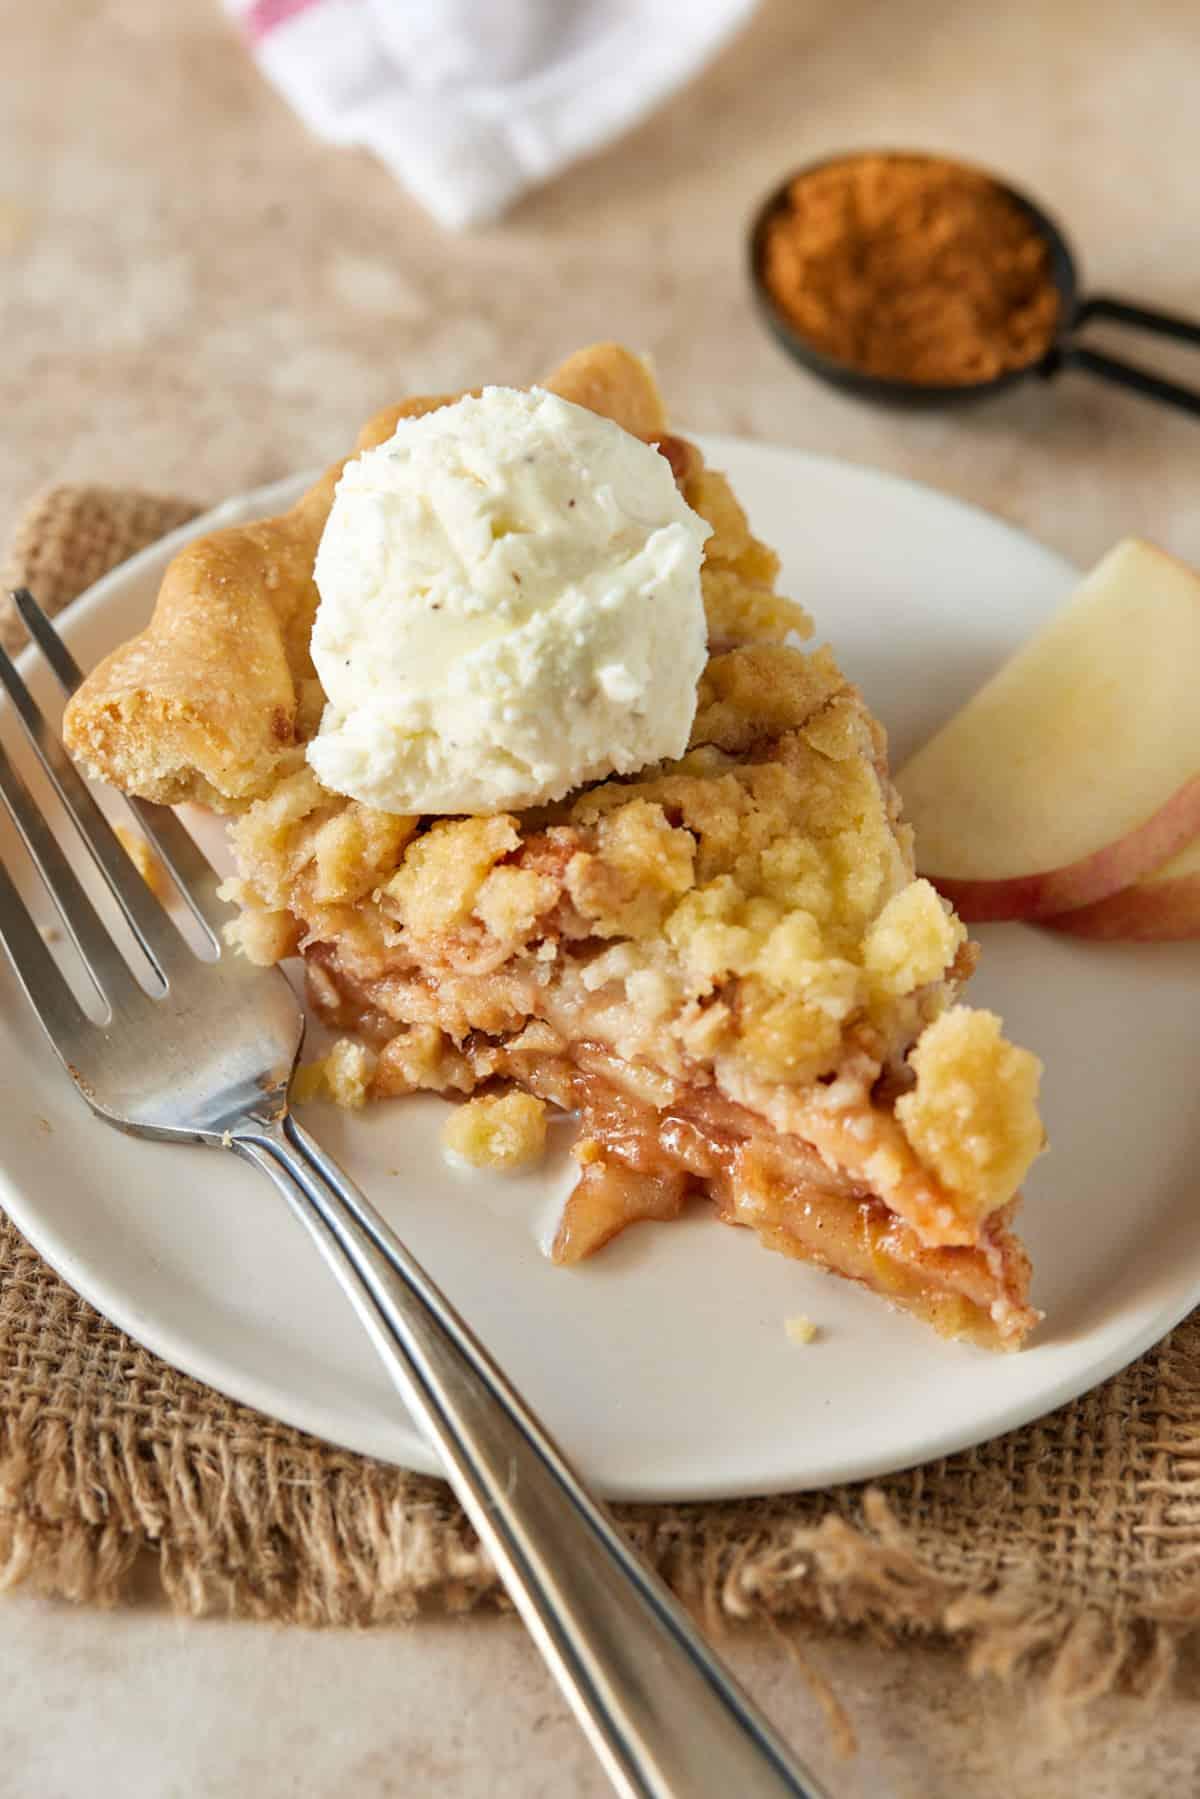 piece of apple crumble pie on plate with vanilla ice cream.